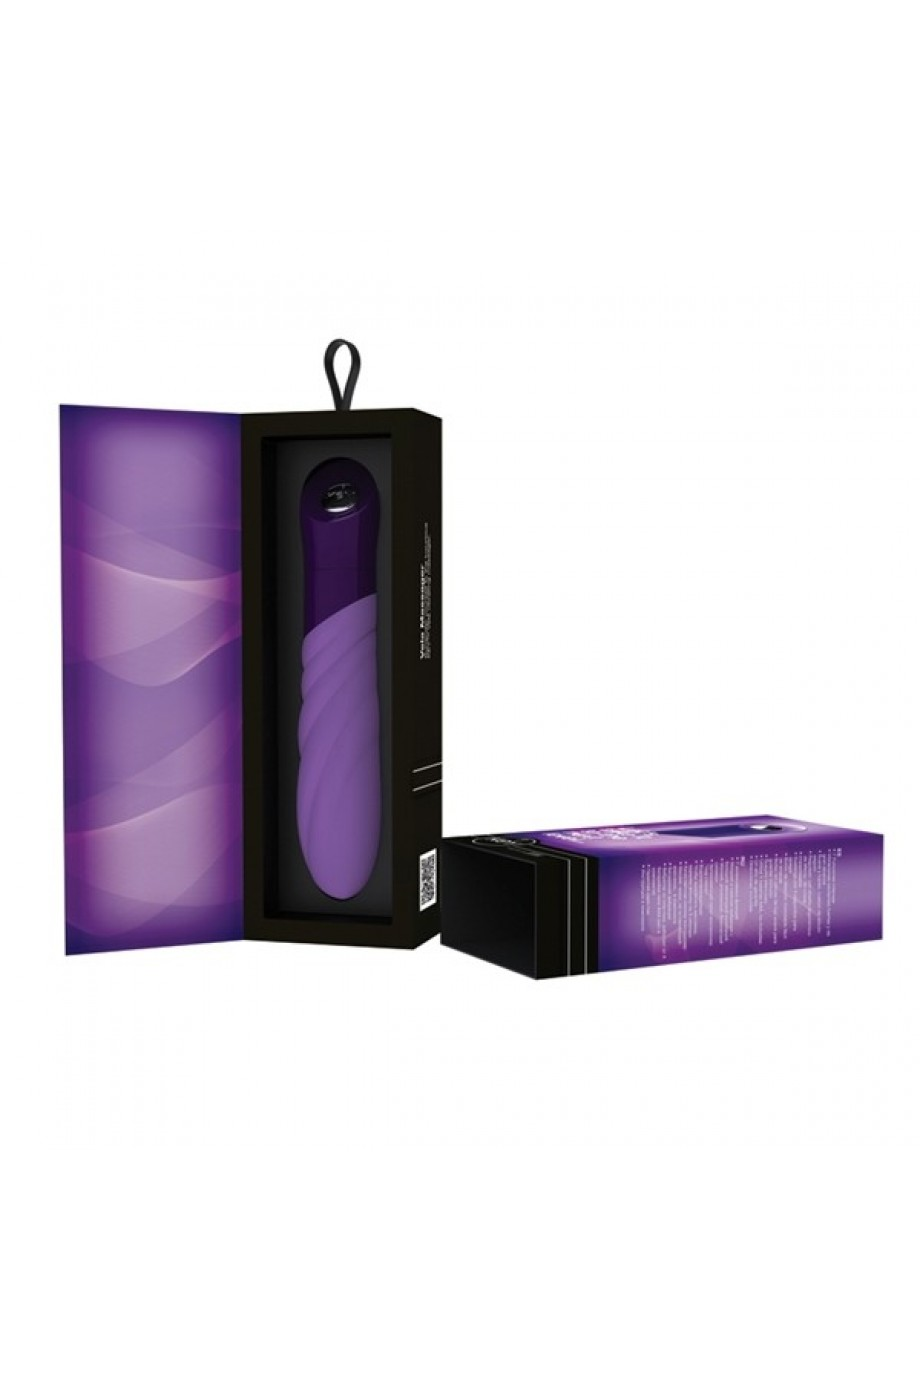 Вибратор Key by Jopen - Vela - Lavende фиолетовый